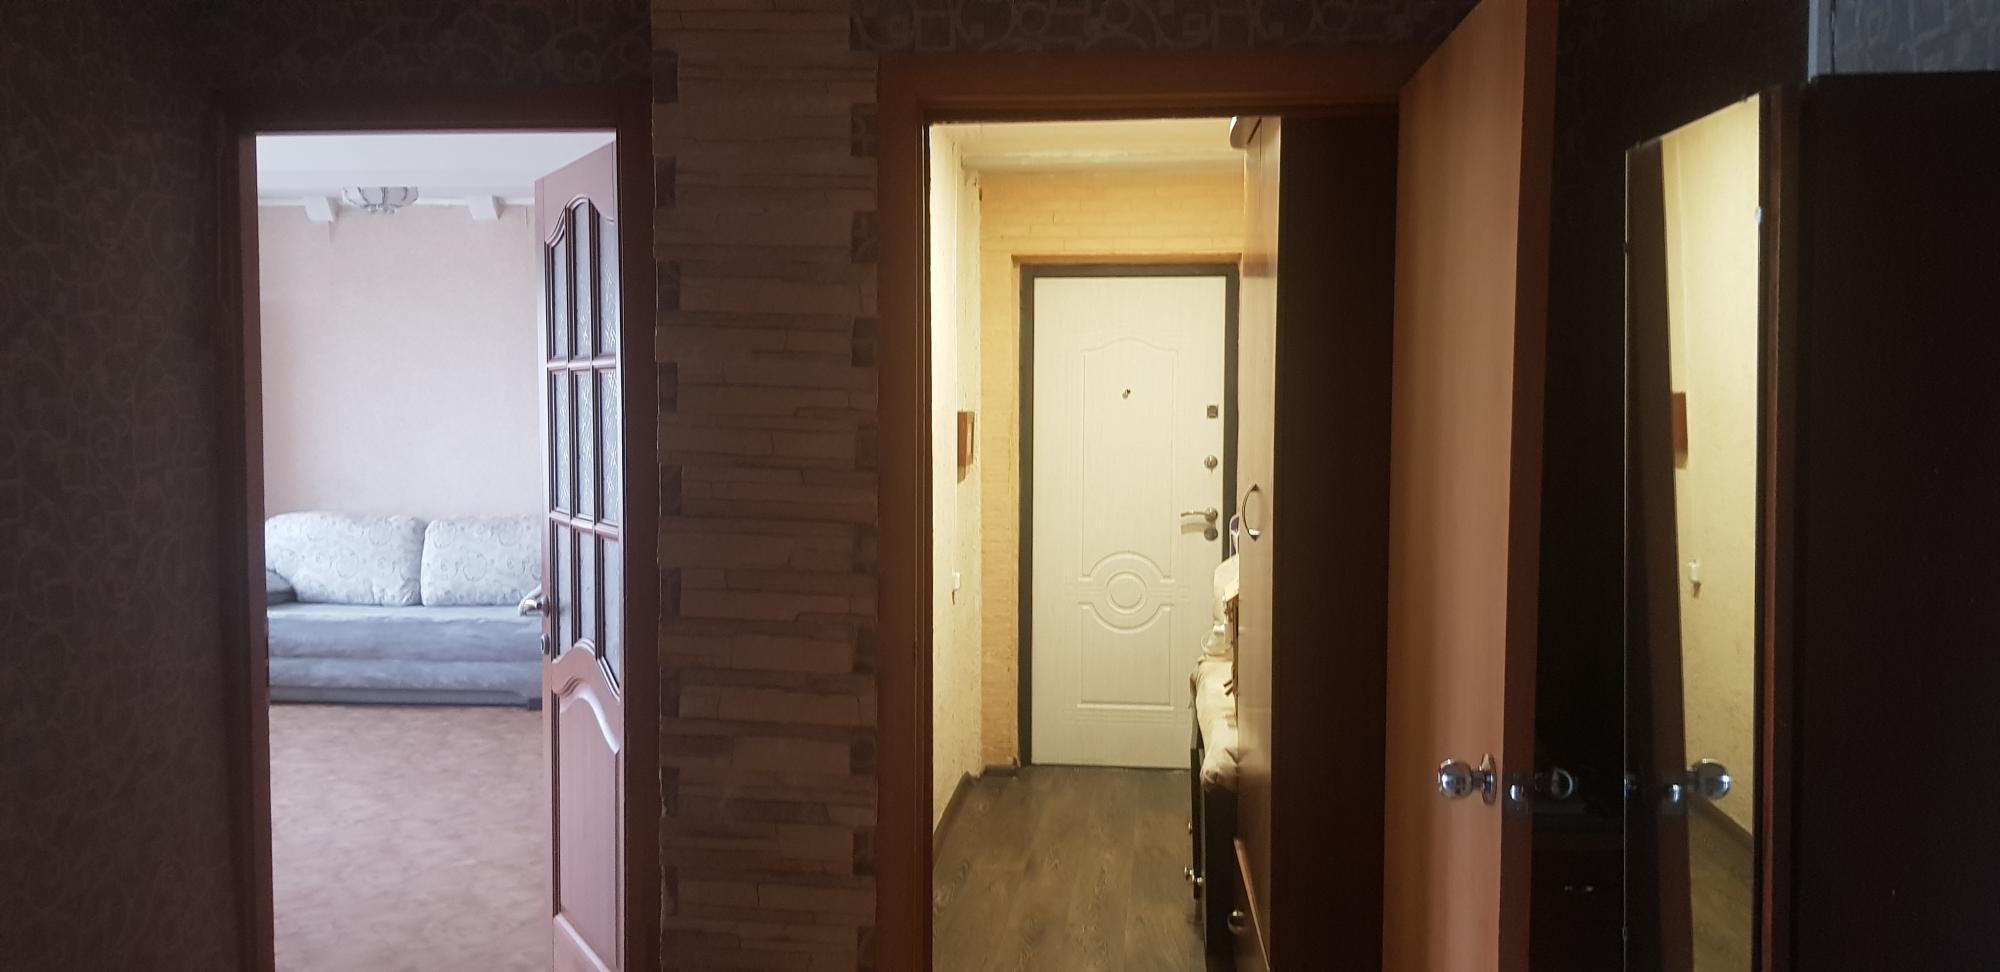 2к квартира улица Краснодарская, 3 | 18000 | аренда в Красноярске фото 7